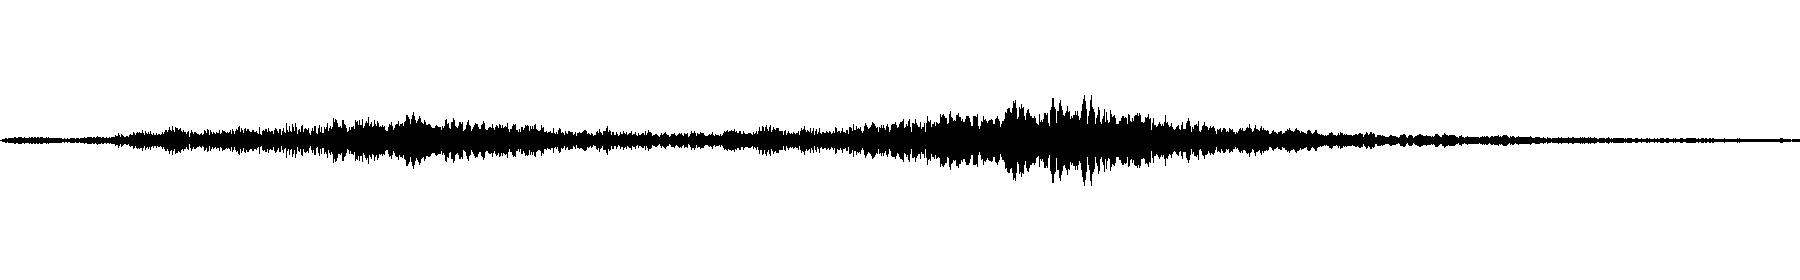 ejemplo para utilizar choir